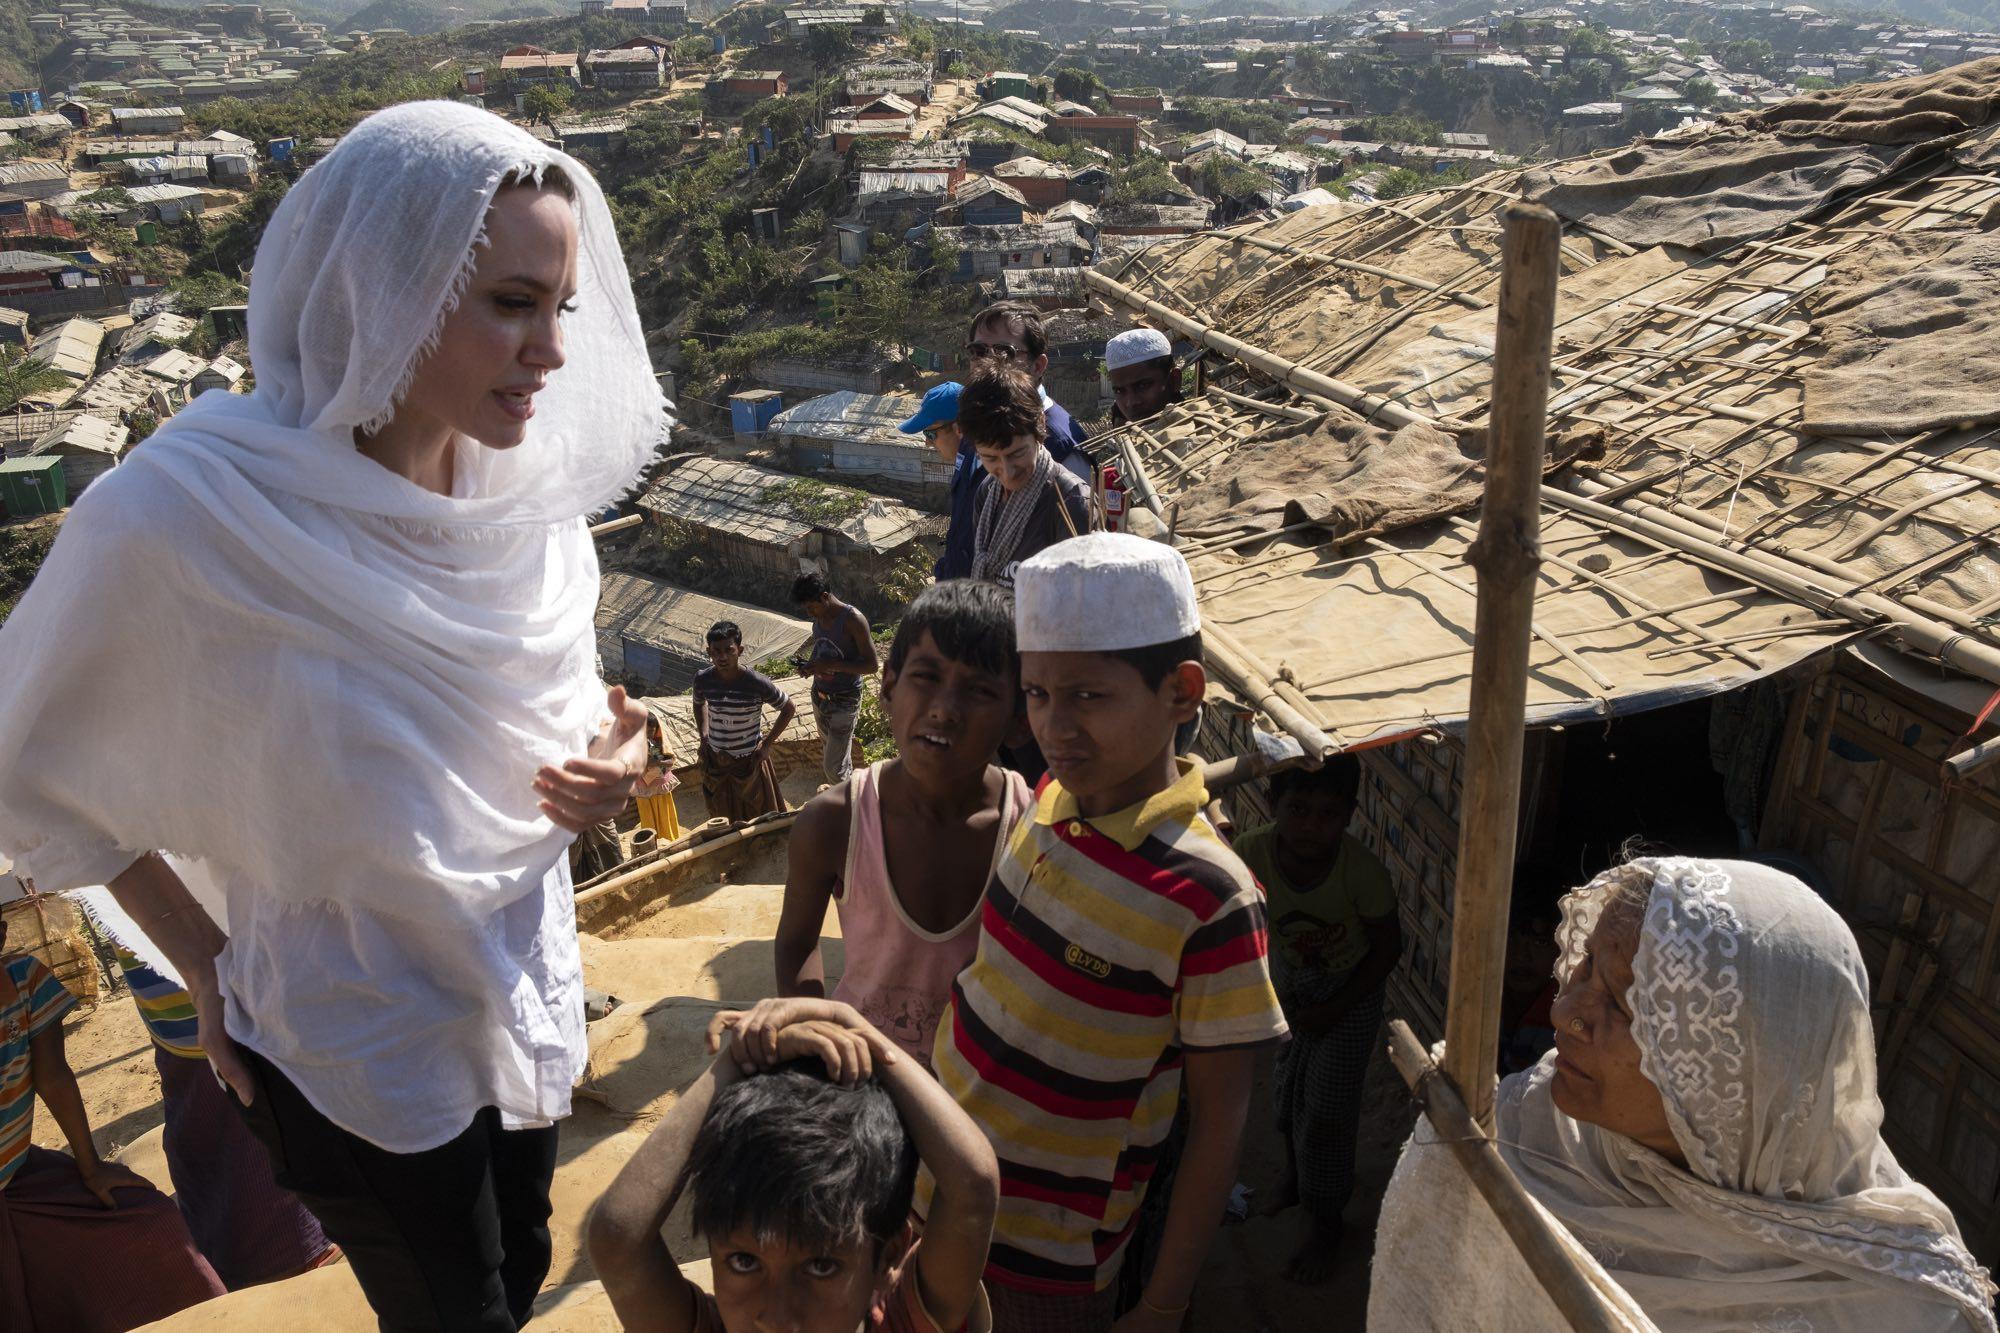 February 2019, Bangladesh/Cox's Bazar: Jolie gets insight into the humanitarian situation of the Rohingya refugees, © UNHCR/ Santiago Escobar- Jaramillo